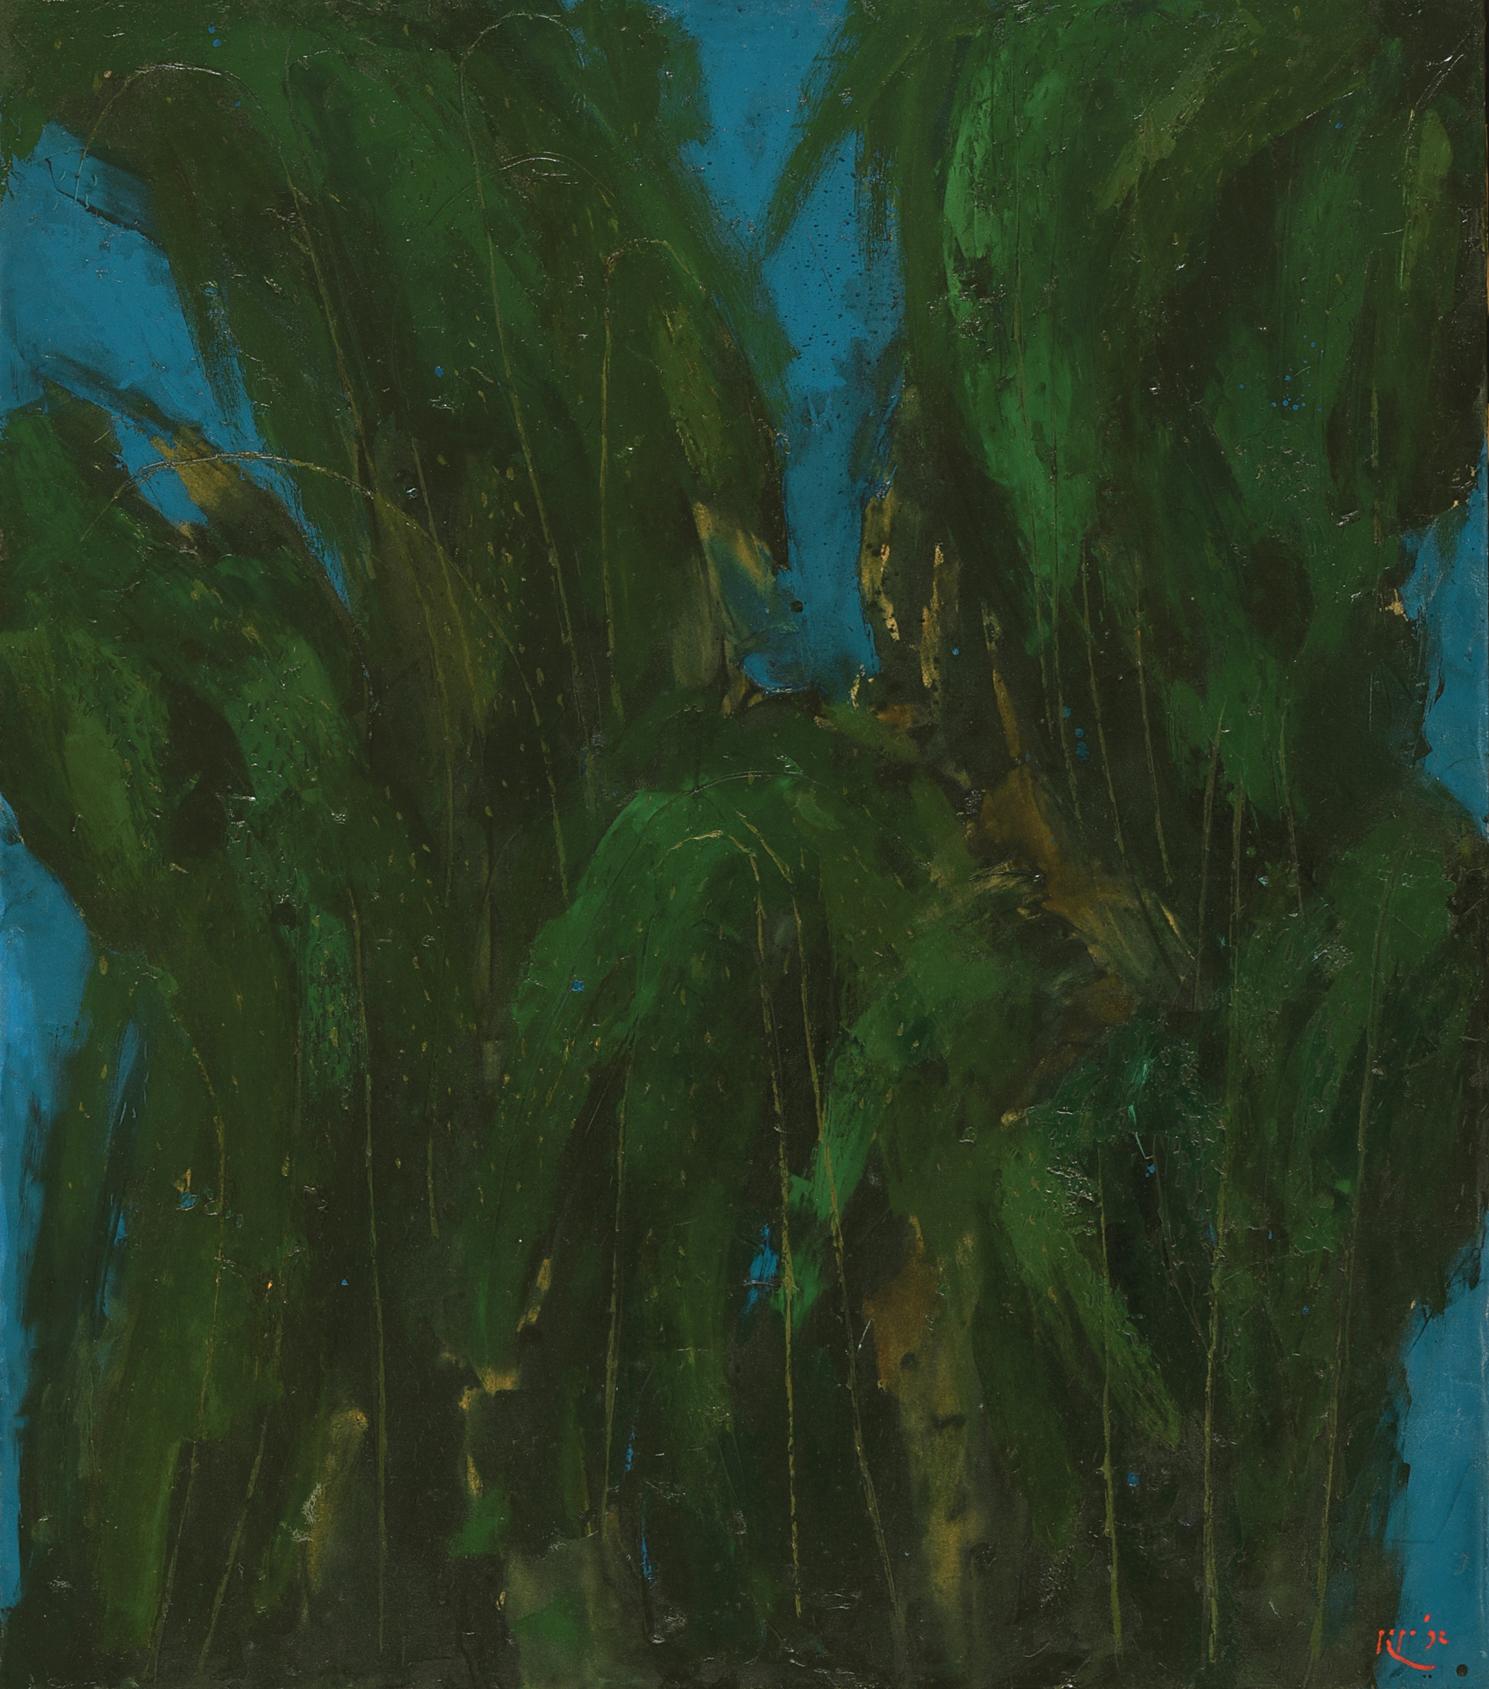 Popo Iskandar, Bamboo II, oil on canvas, 124.5 x 142.5 cm, 1992